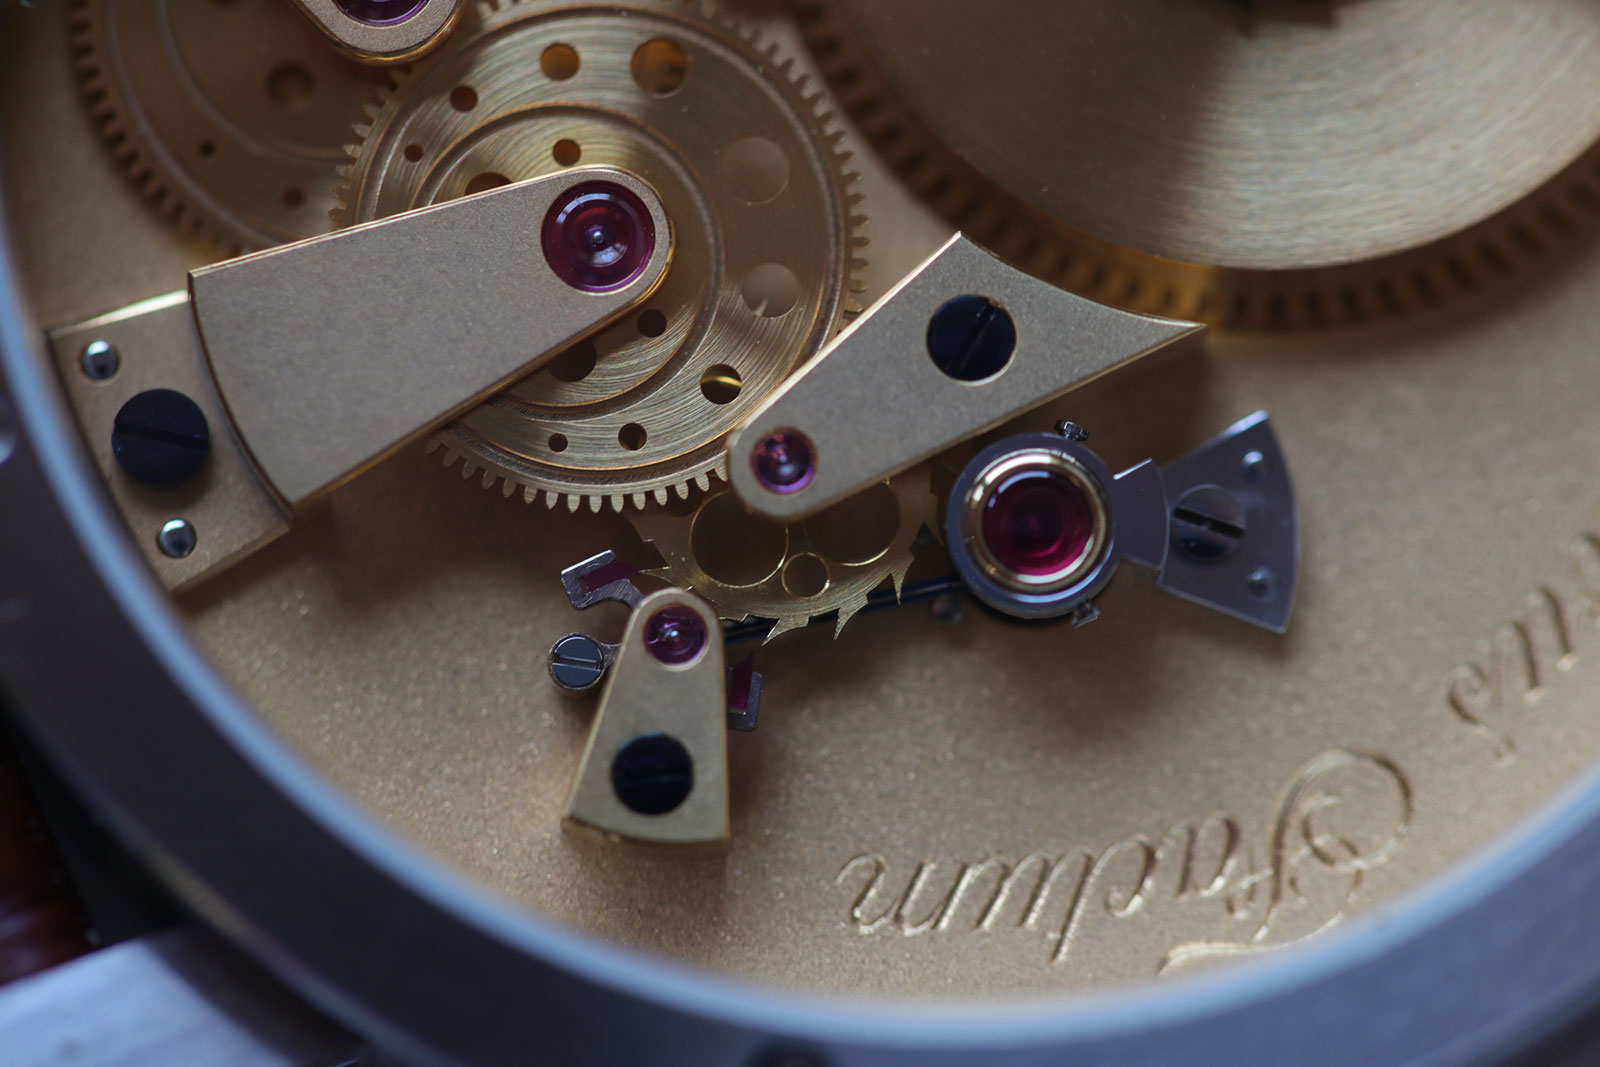 Brivet-Naudot wristwatch 4